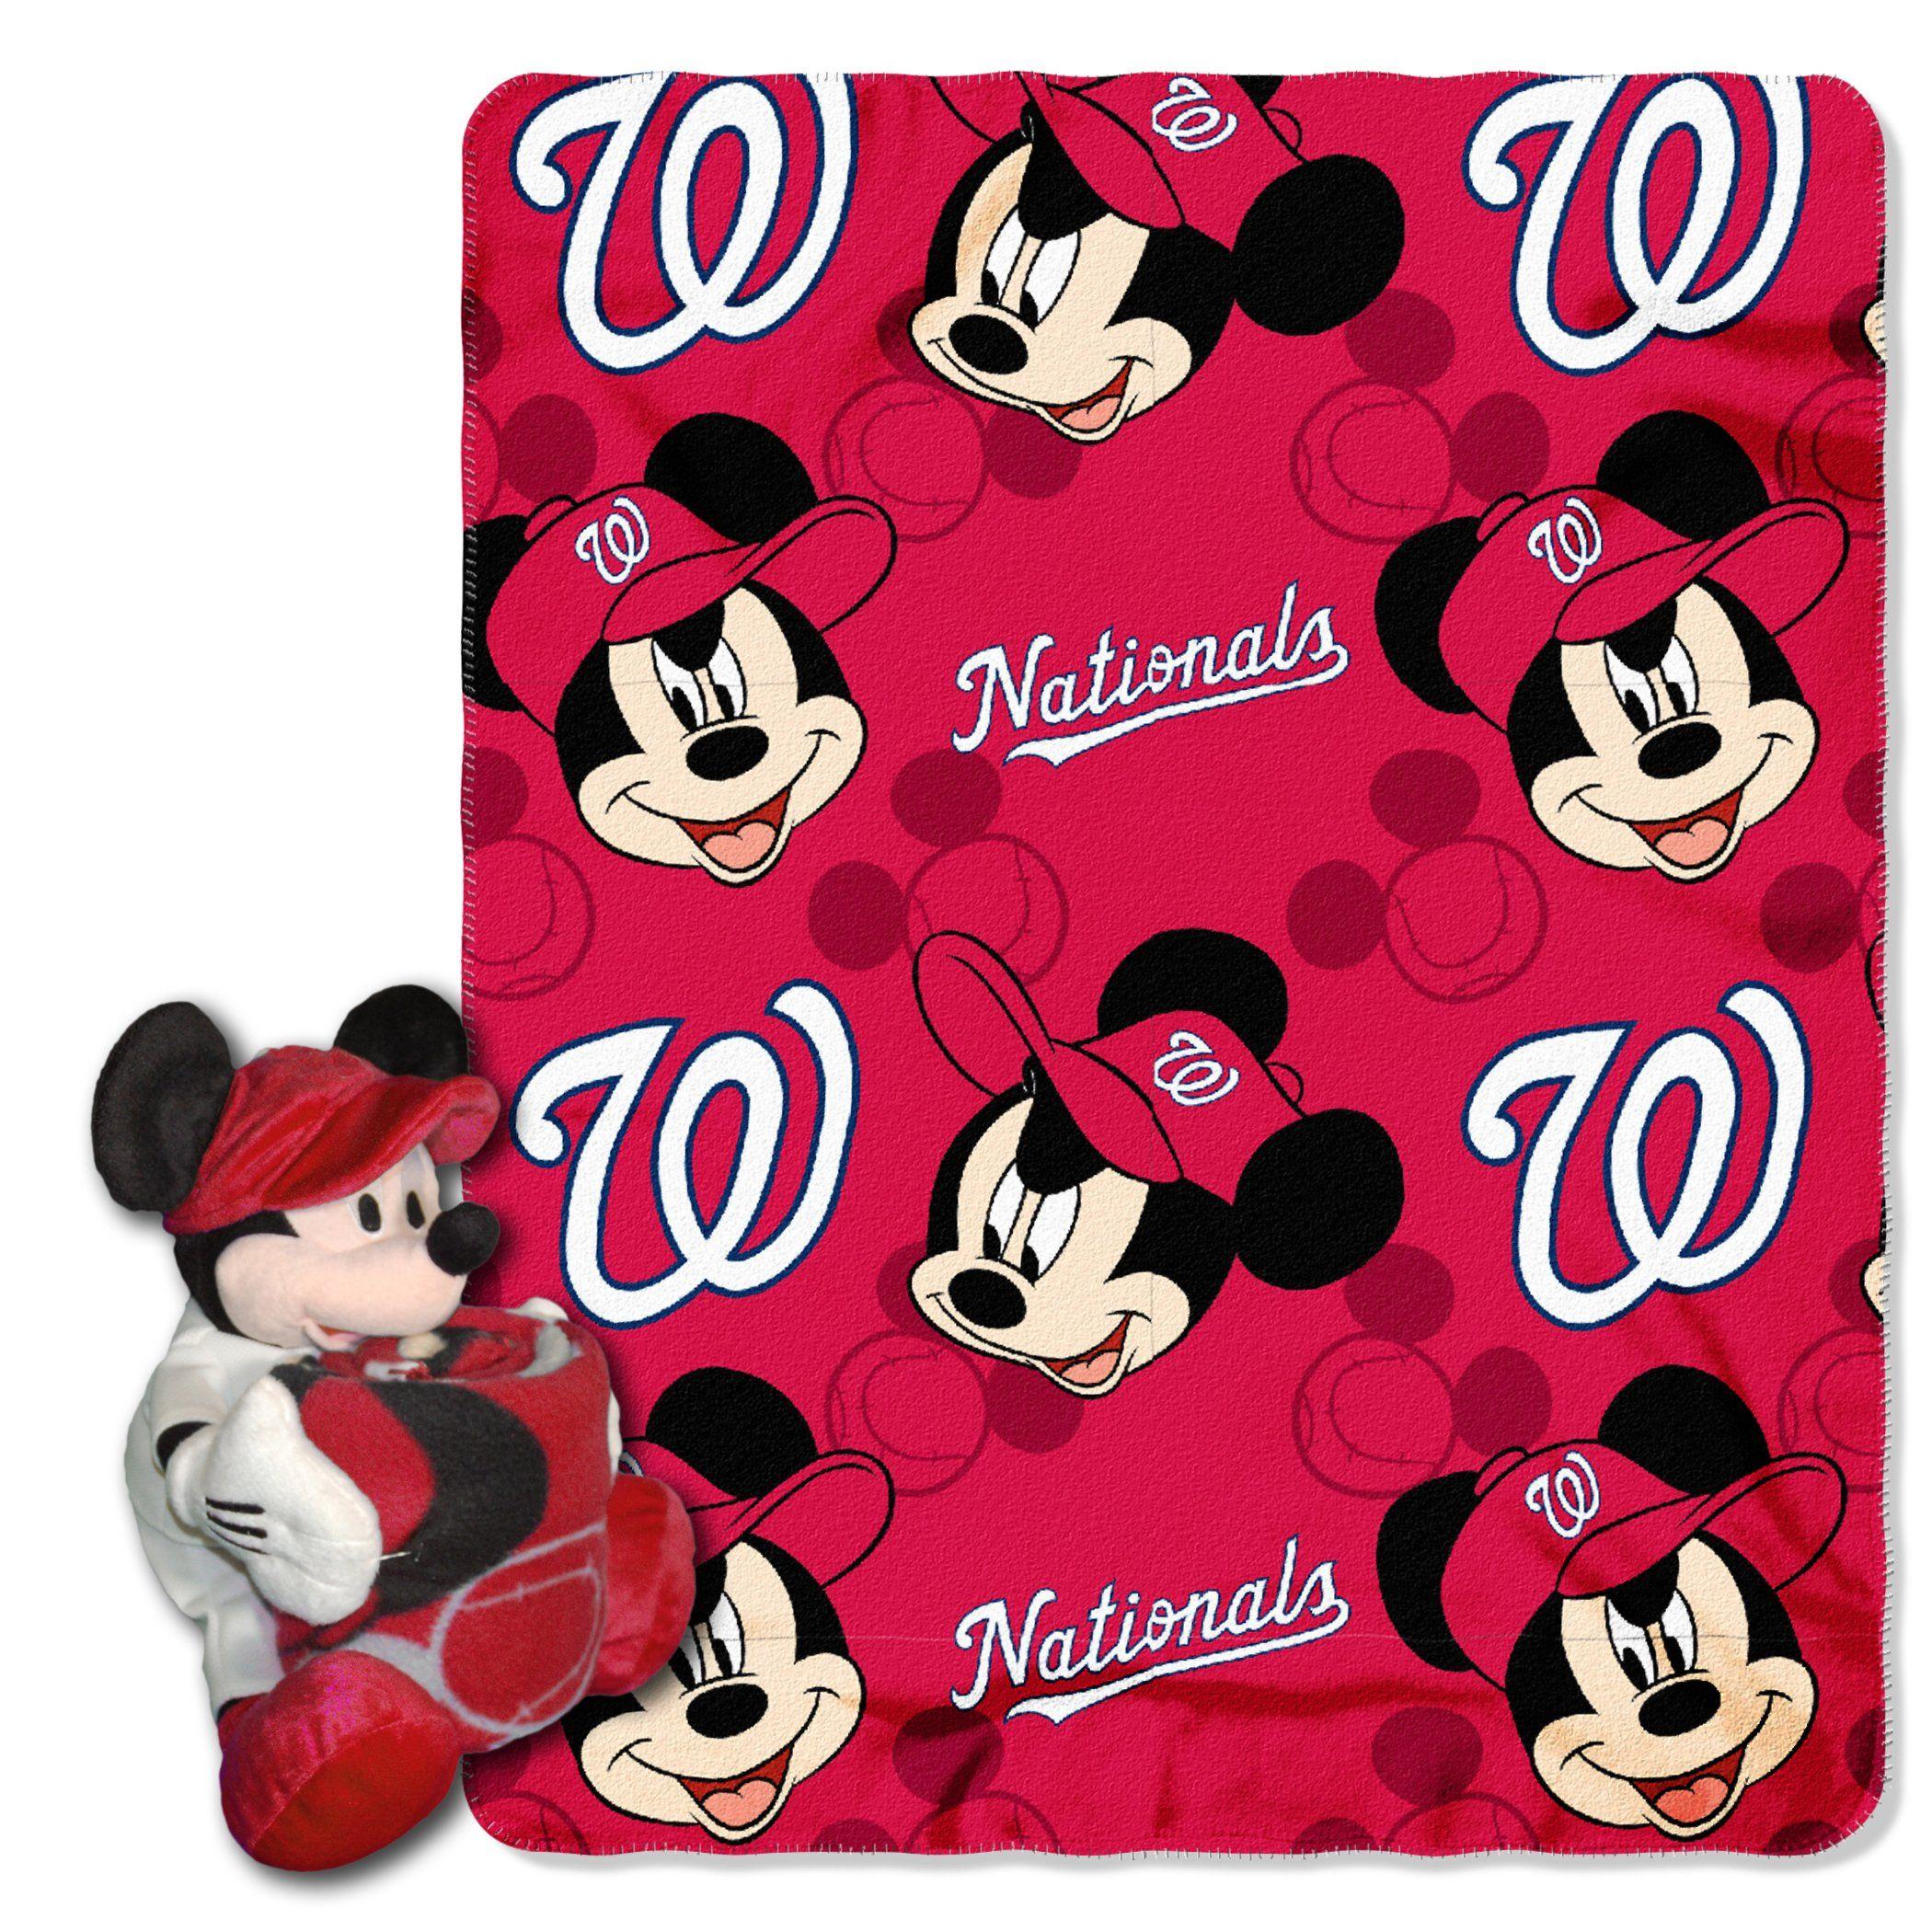 Nationals Official Major League Baseball Disney Cobranded Mickey Mouse Hugger Character Shaped Pillow And 40 X 50 Fleece Washington Nationals Mickey Disney